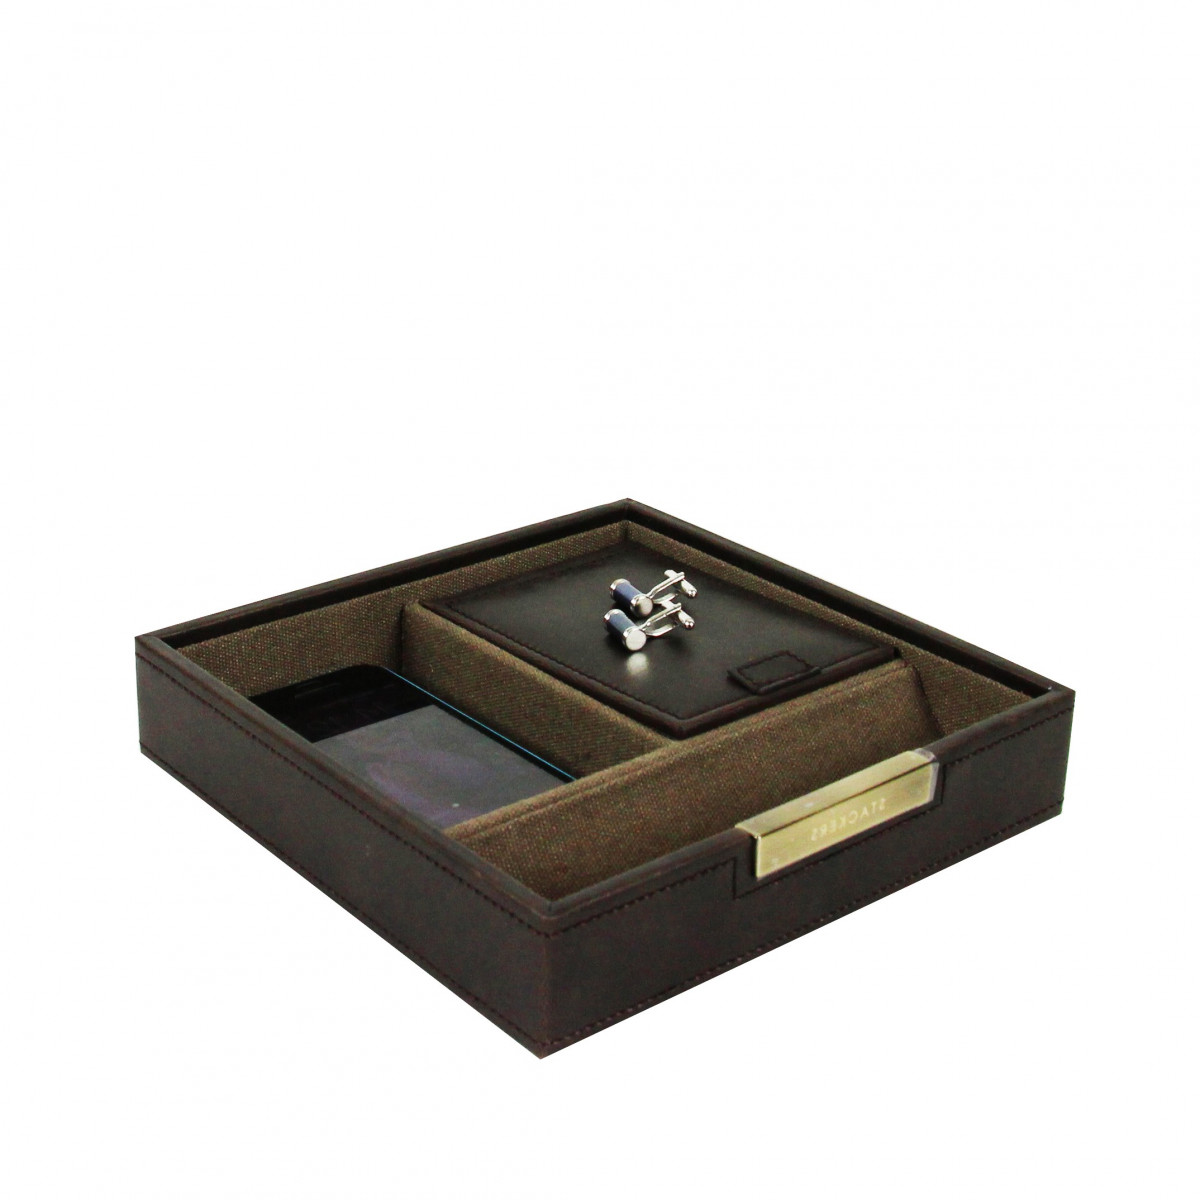 vide poche marron rangement petits accessoires. Black Bedroom Furniture Sets. Home Design Ideas